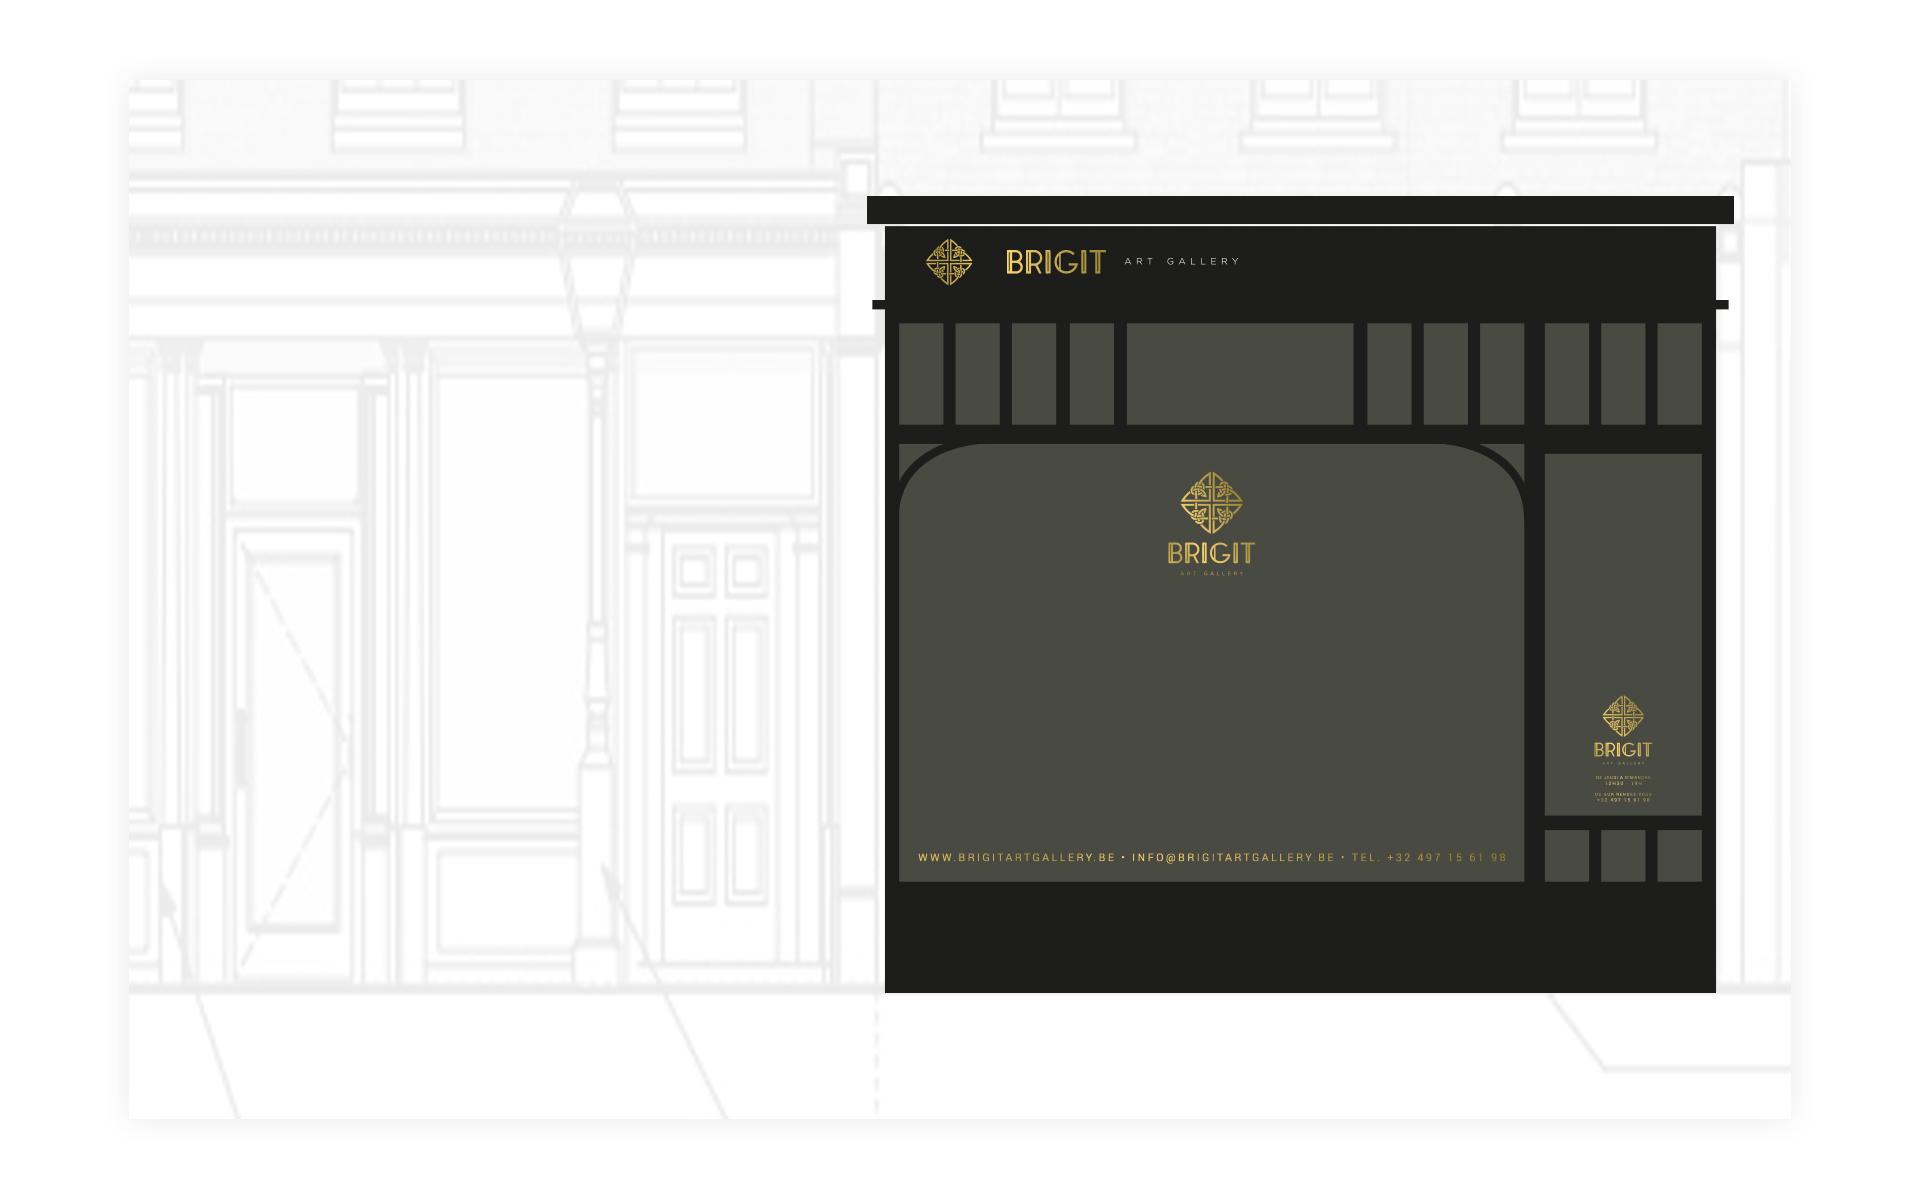 brigit facade design.jpg